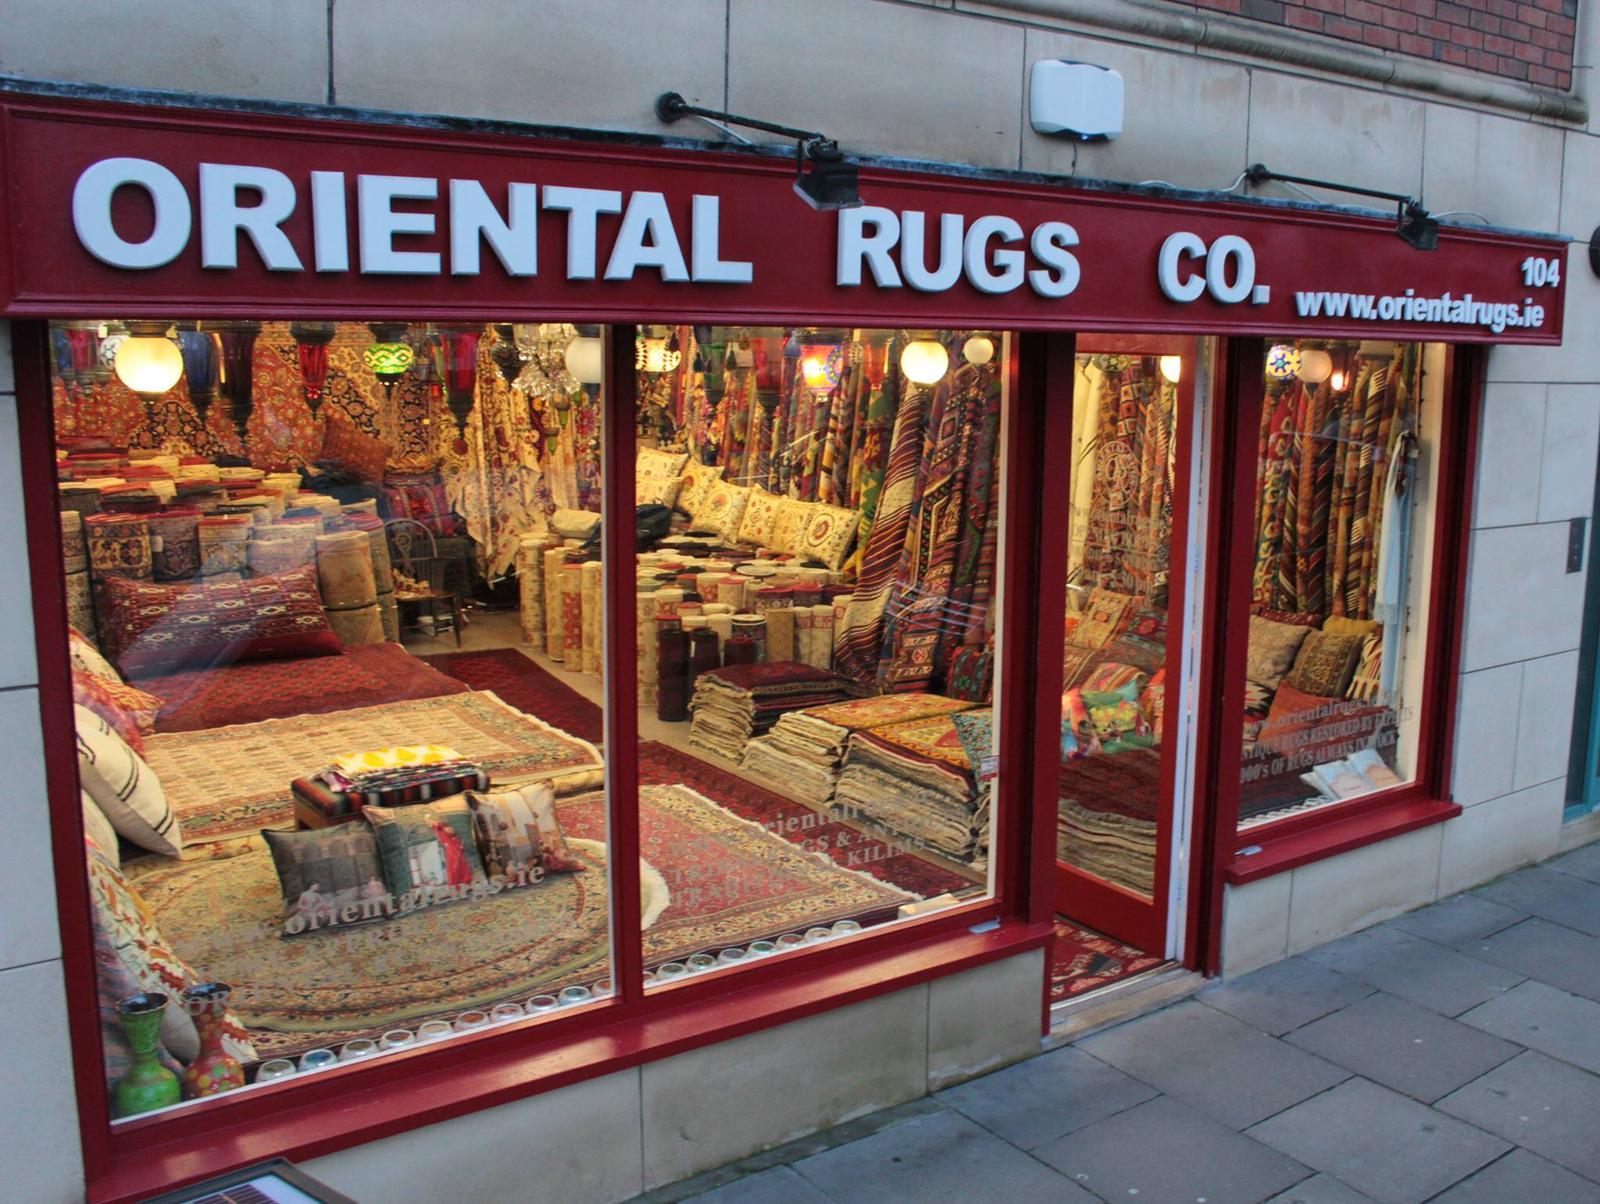 Oriental Rugs Ie Direct Importers Of Handmade Rugs